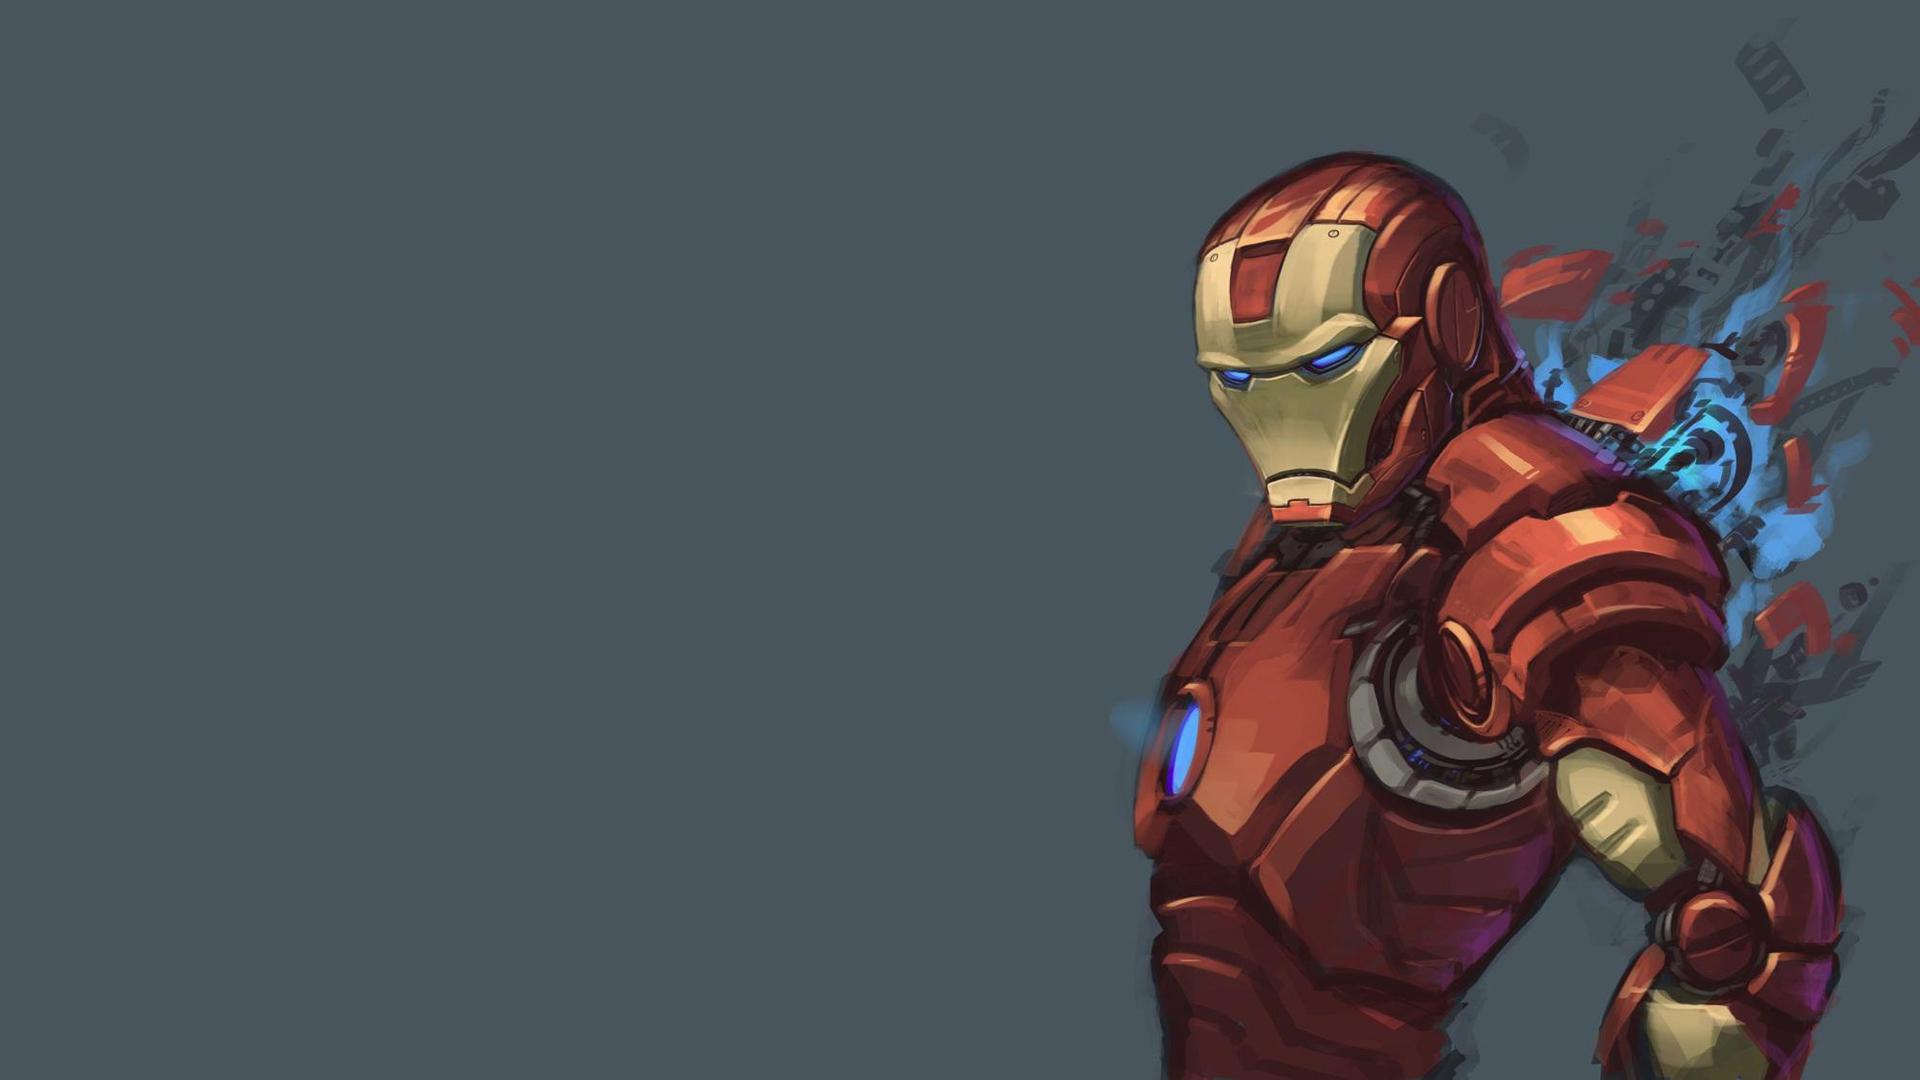 Iron Man Wallpaper 1920x1080 Iron Man Comics Marvel Comics 1920x1080